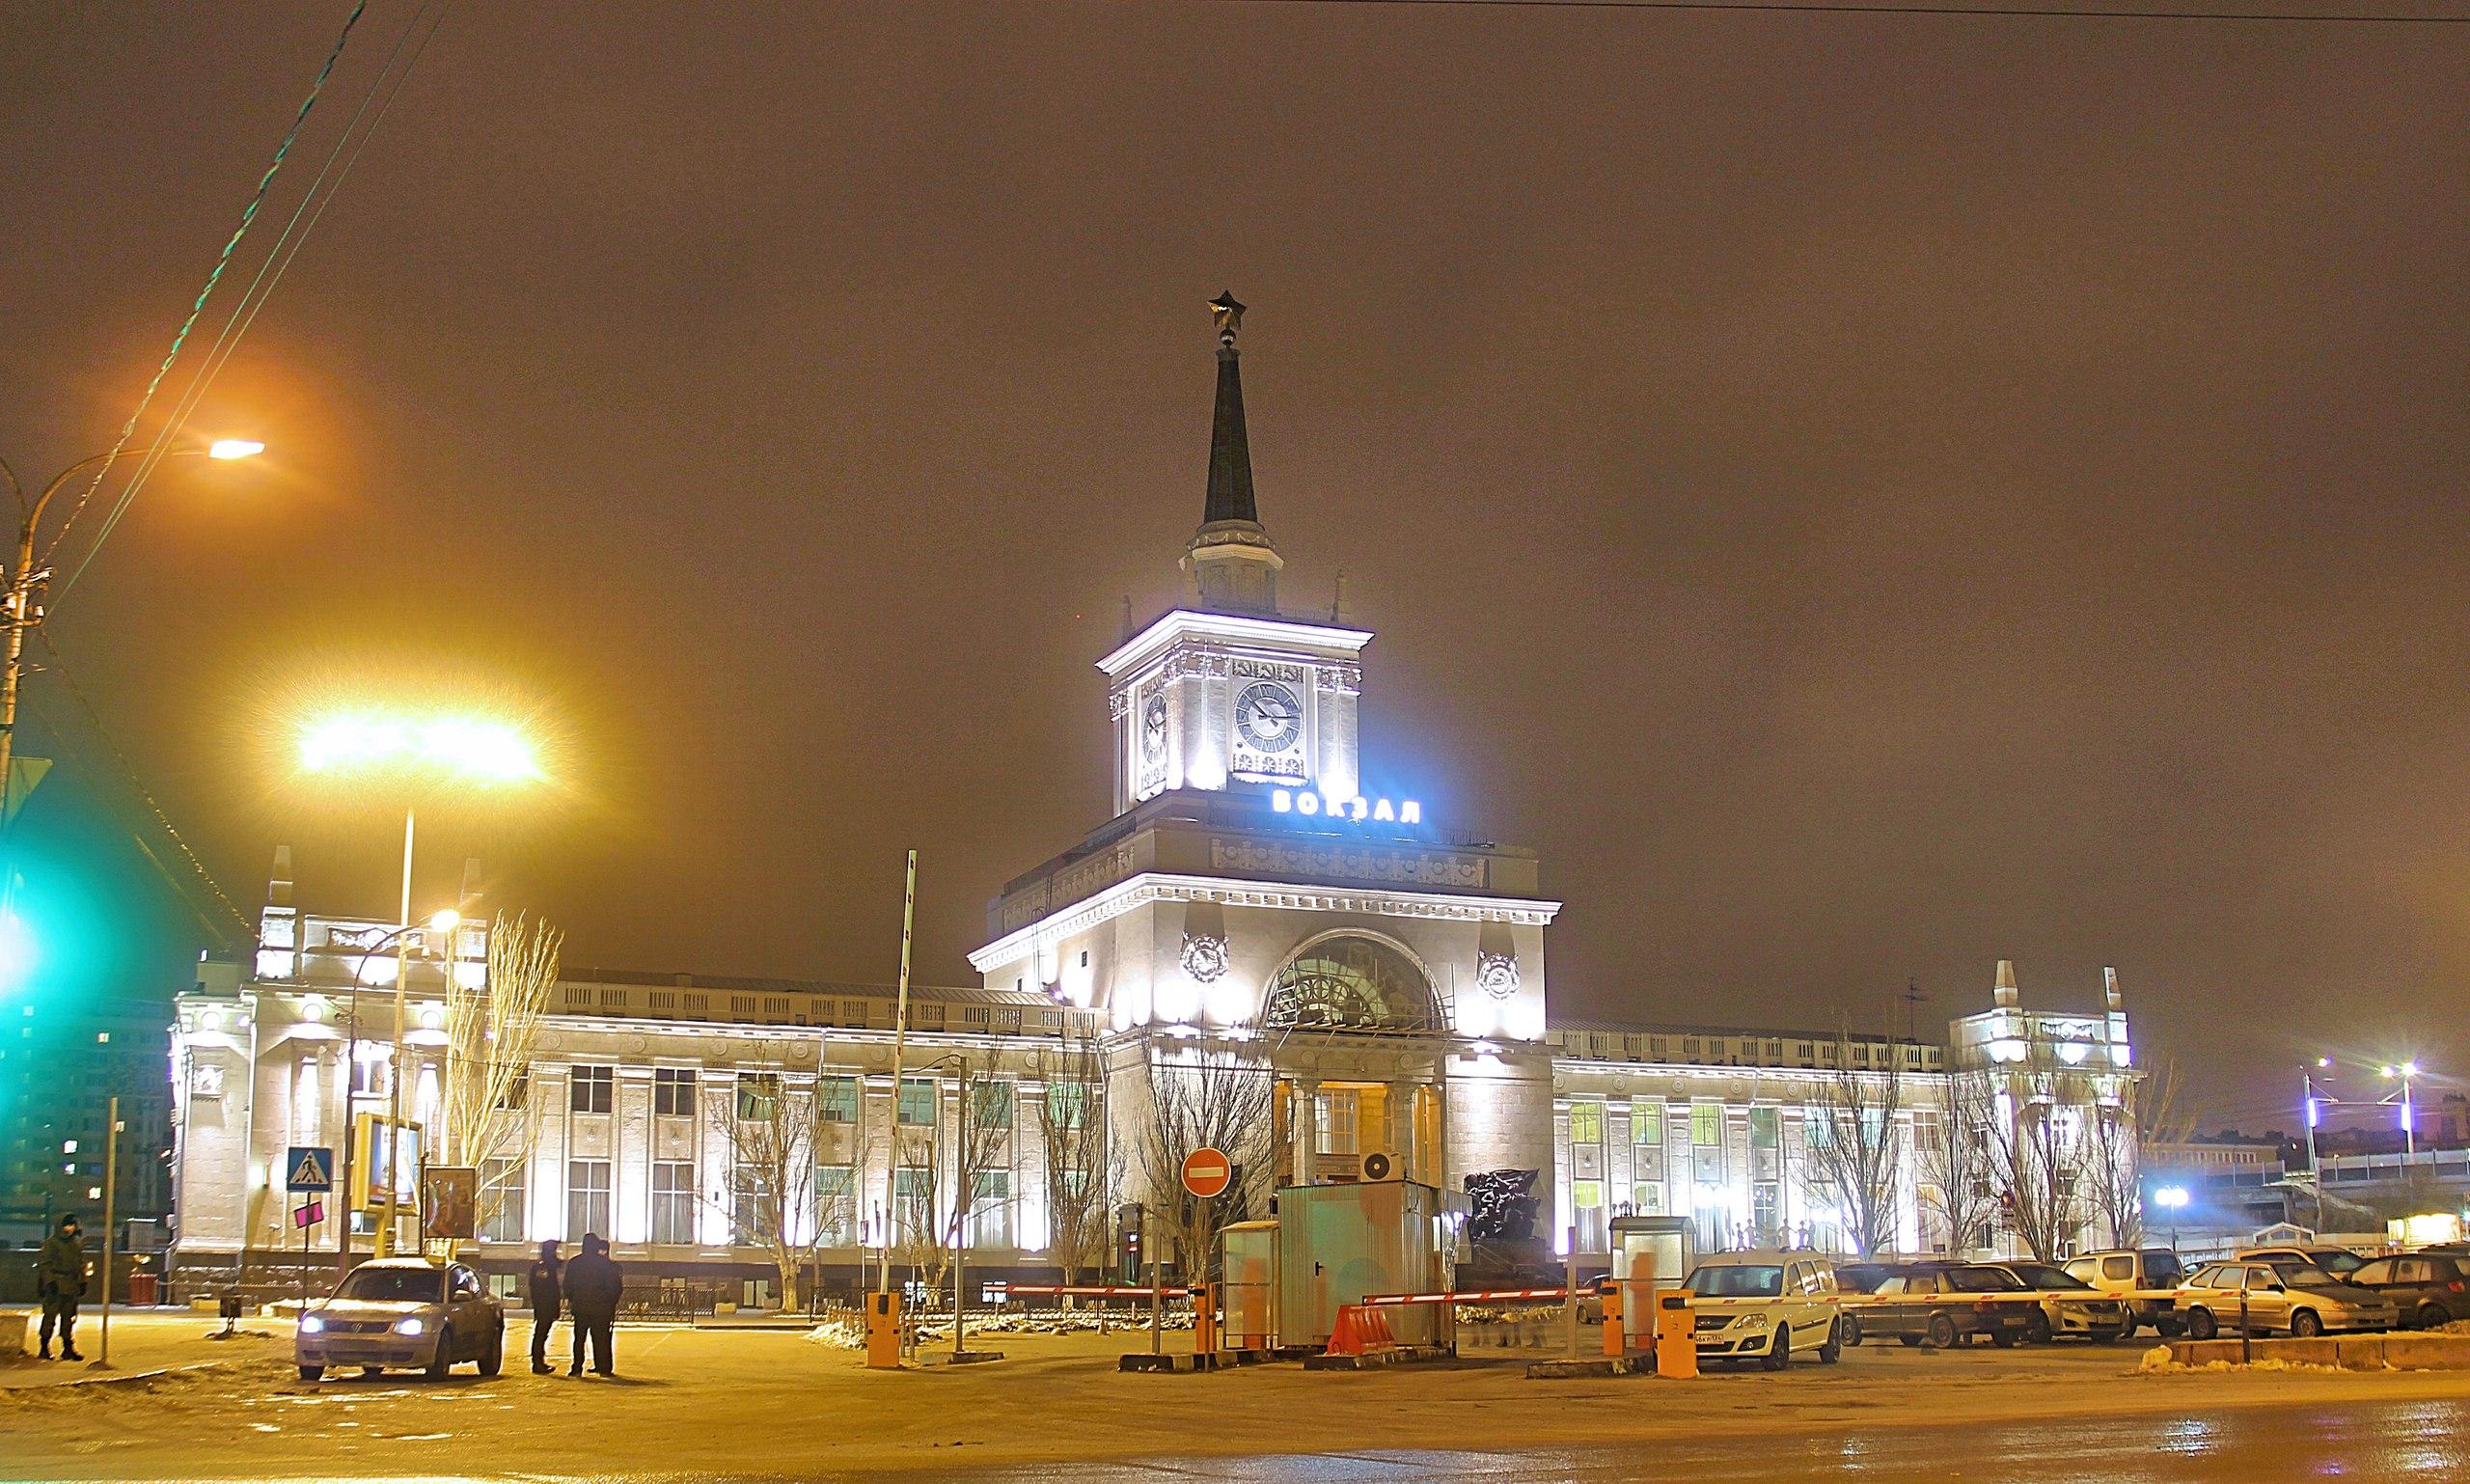 картинки волгоградского вокзала предлагаю